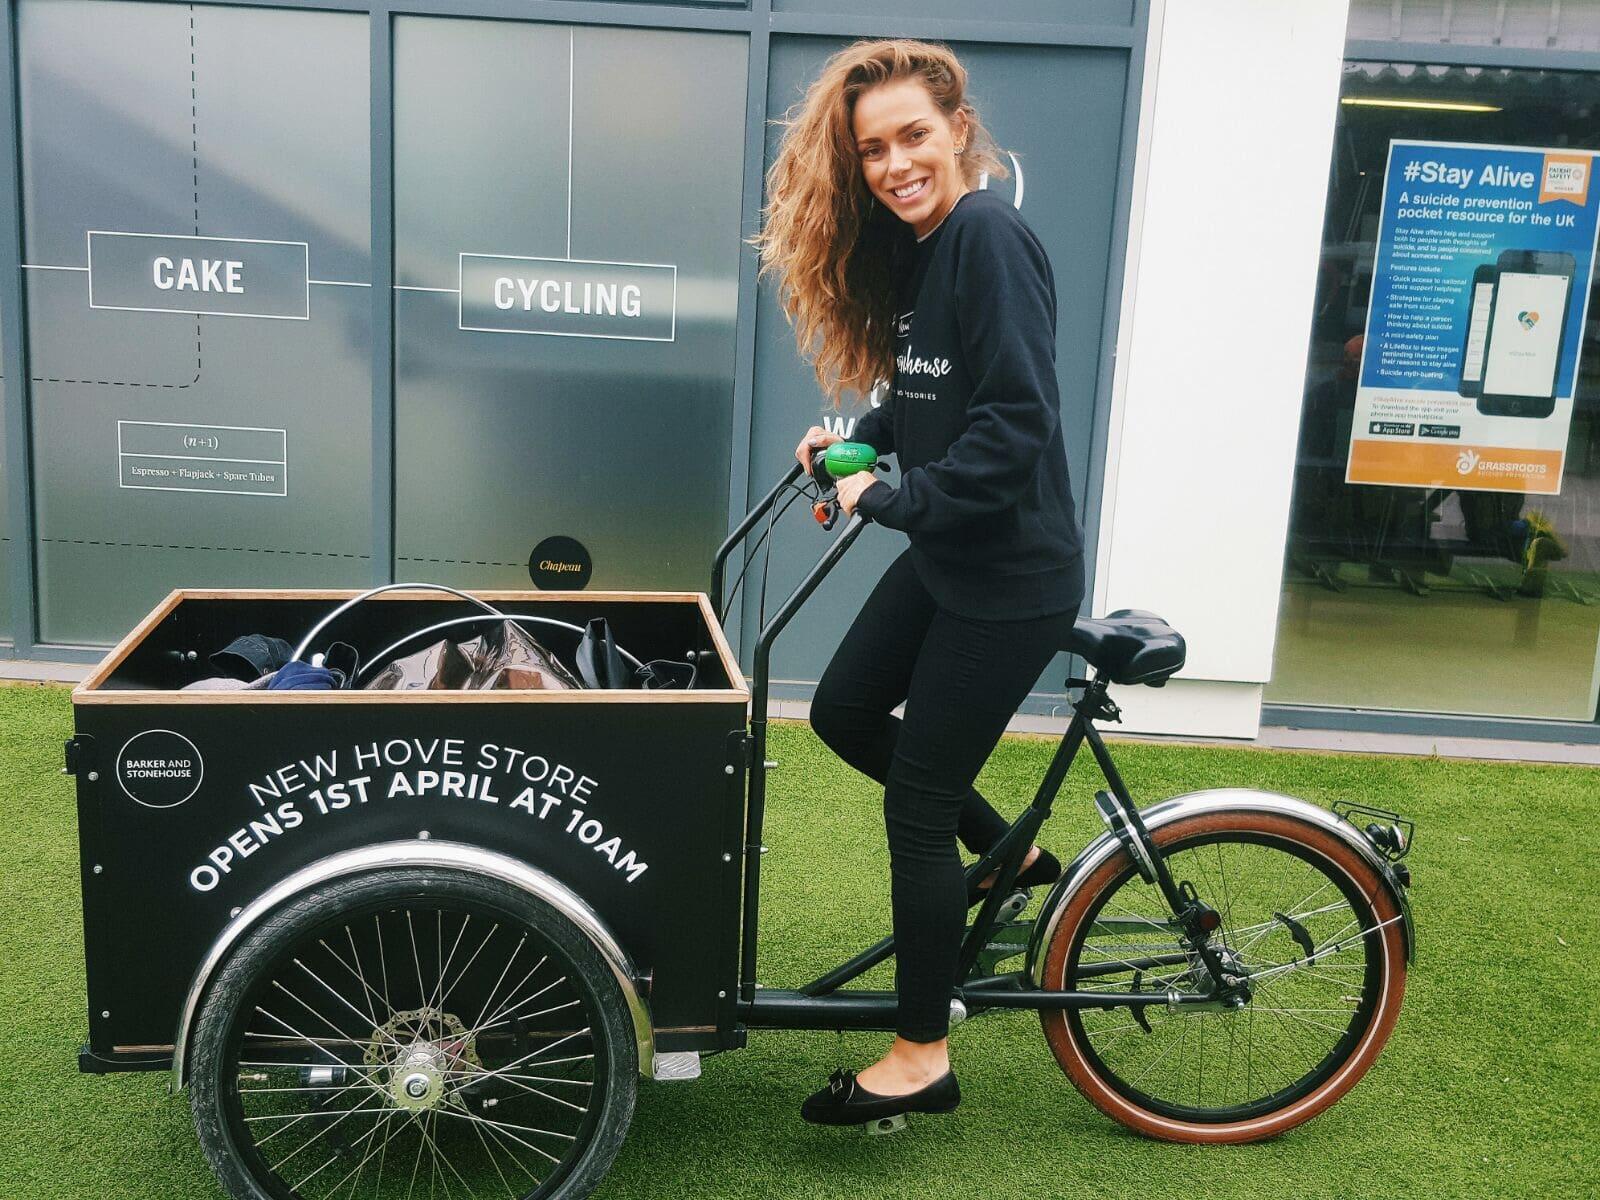 UK-Media-Bikes-from-Varii-Promotions-the-Leading-UK-Media-Bikes-Agency-2020